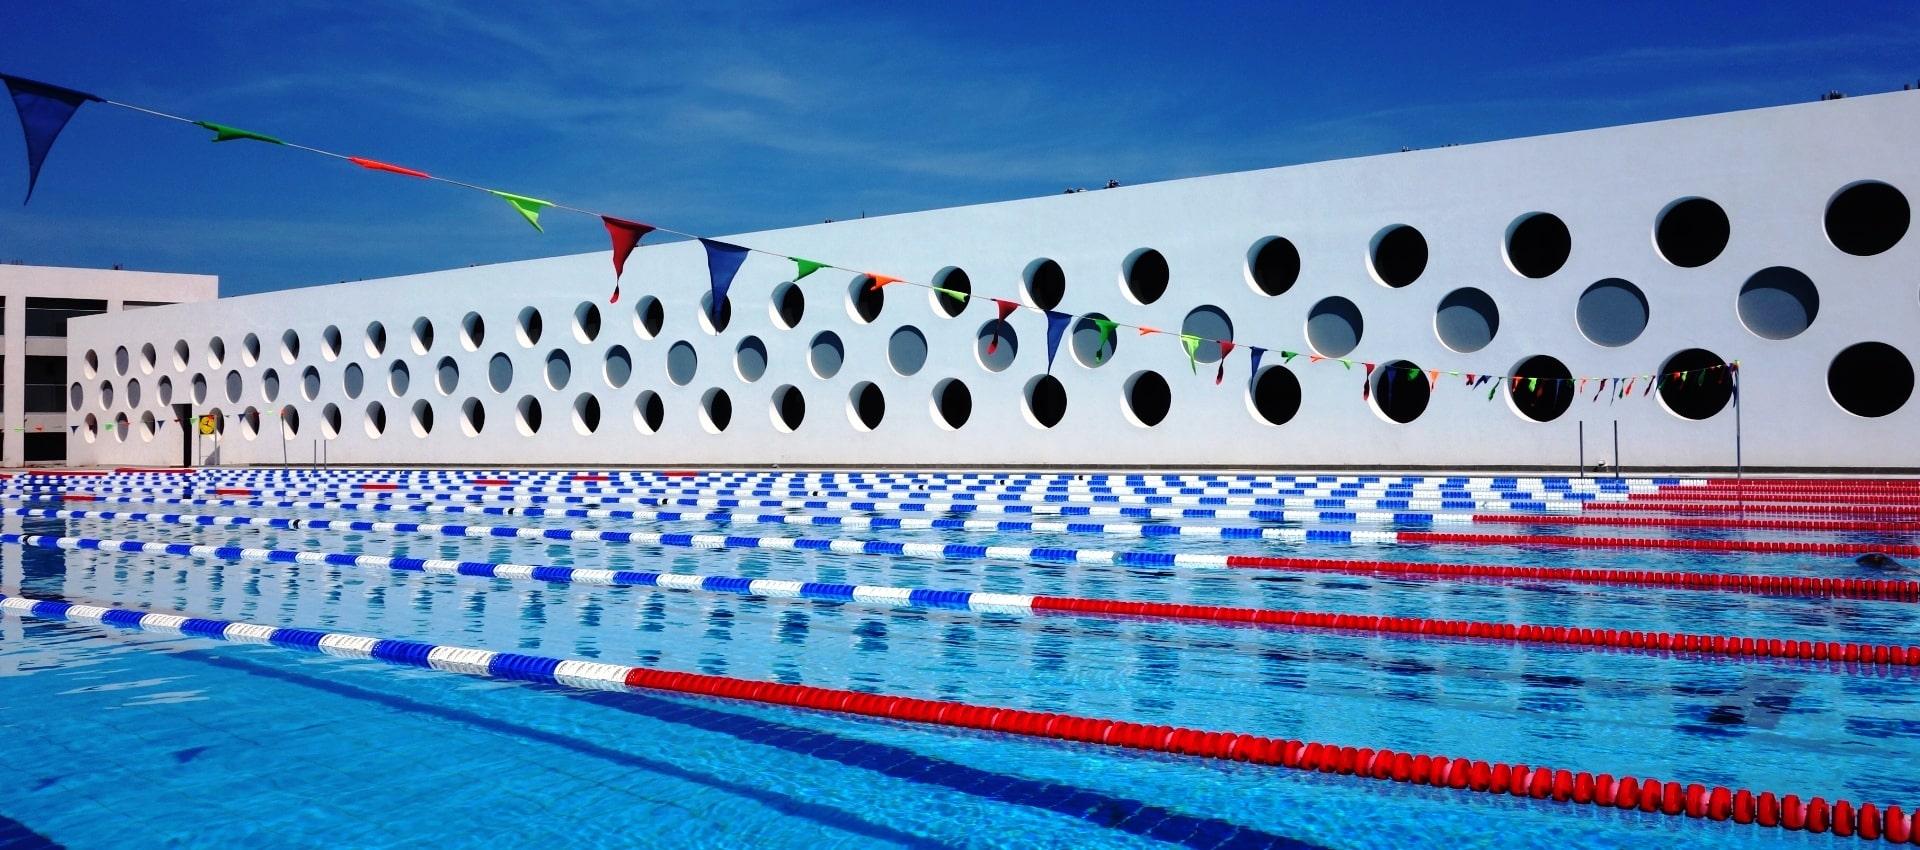 olympic sized swimming pool lyttos beach hotel Crete Greece cycling triathlon training camps